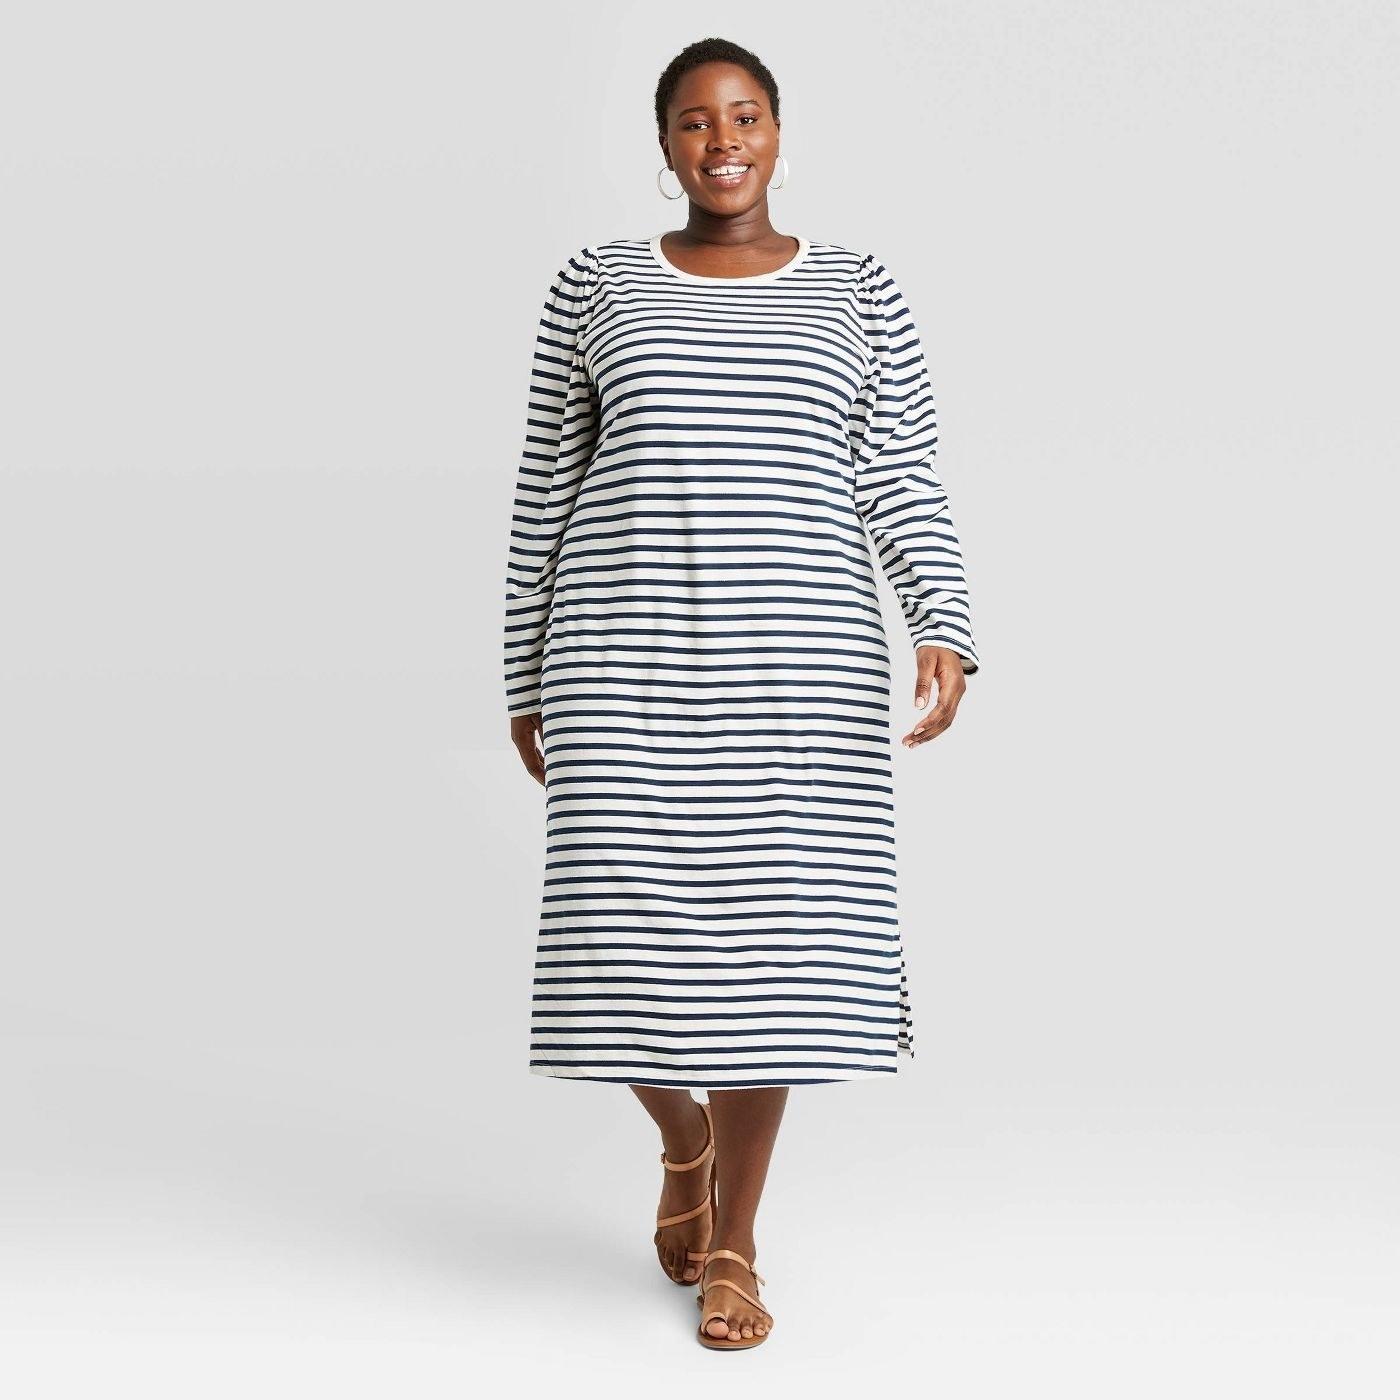 Model wearing navy striped long sleeve maxi dress